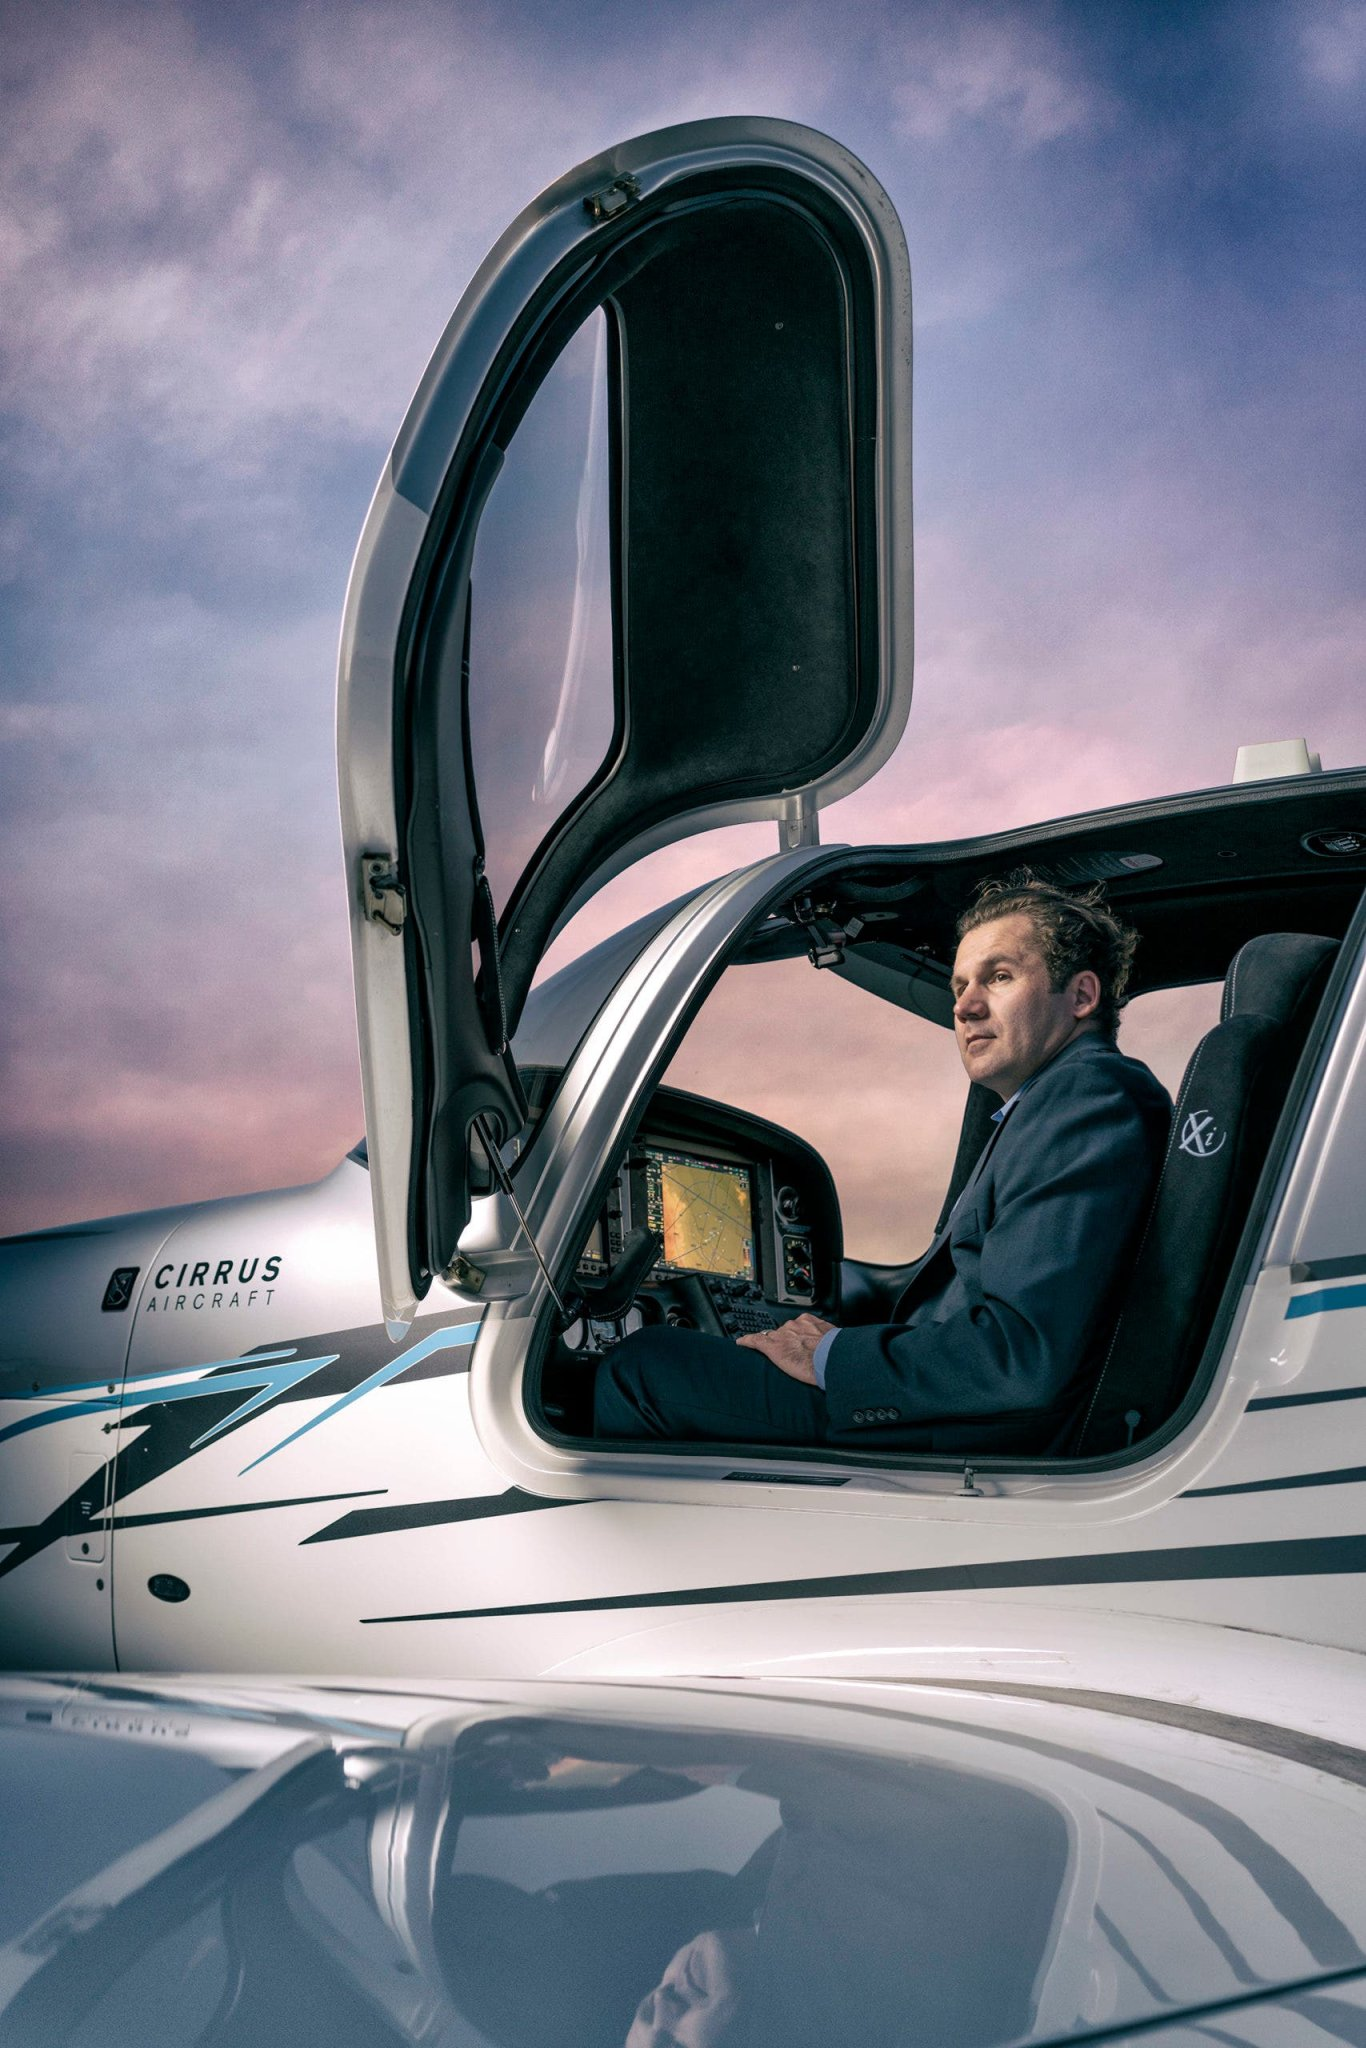 How Carl Schultz Shot an Environmental Portrait of a Chief Flight Instructor